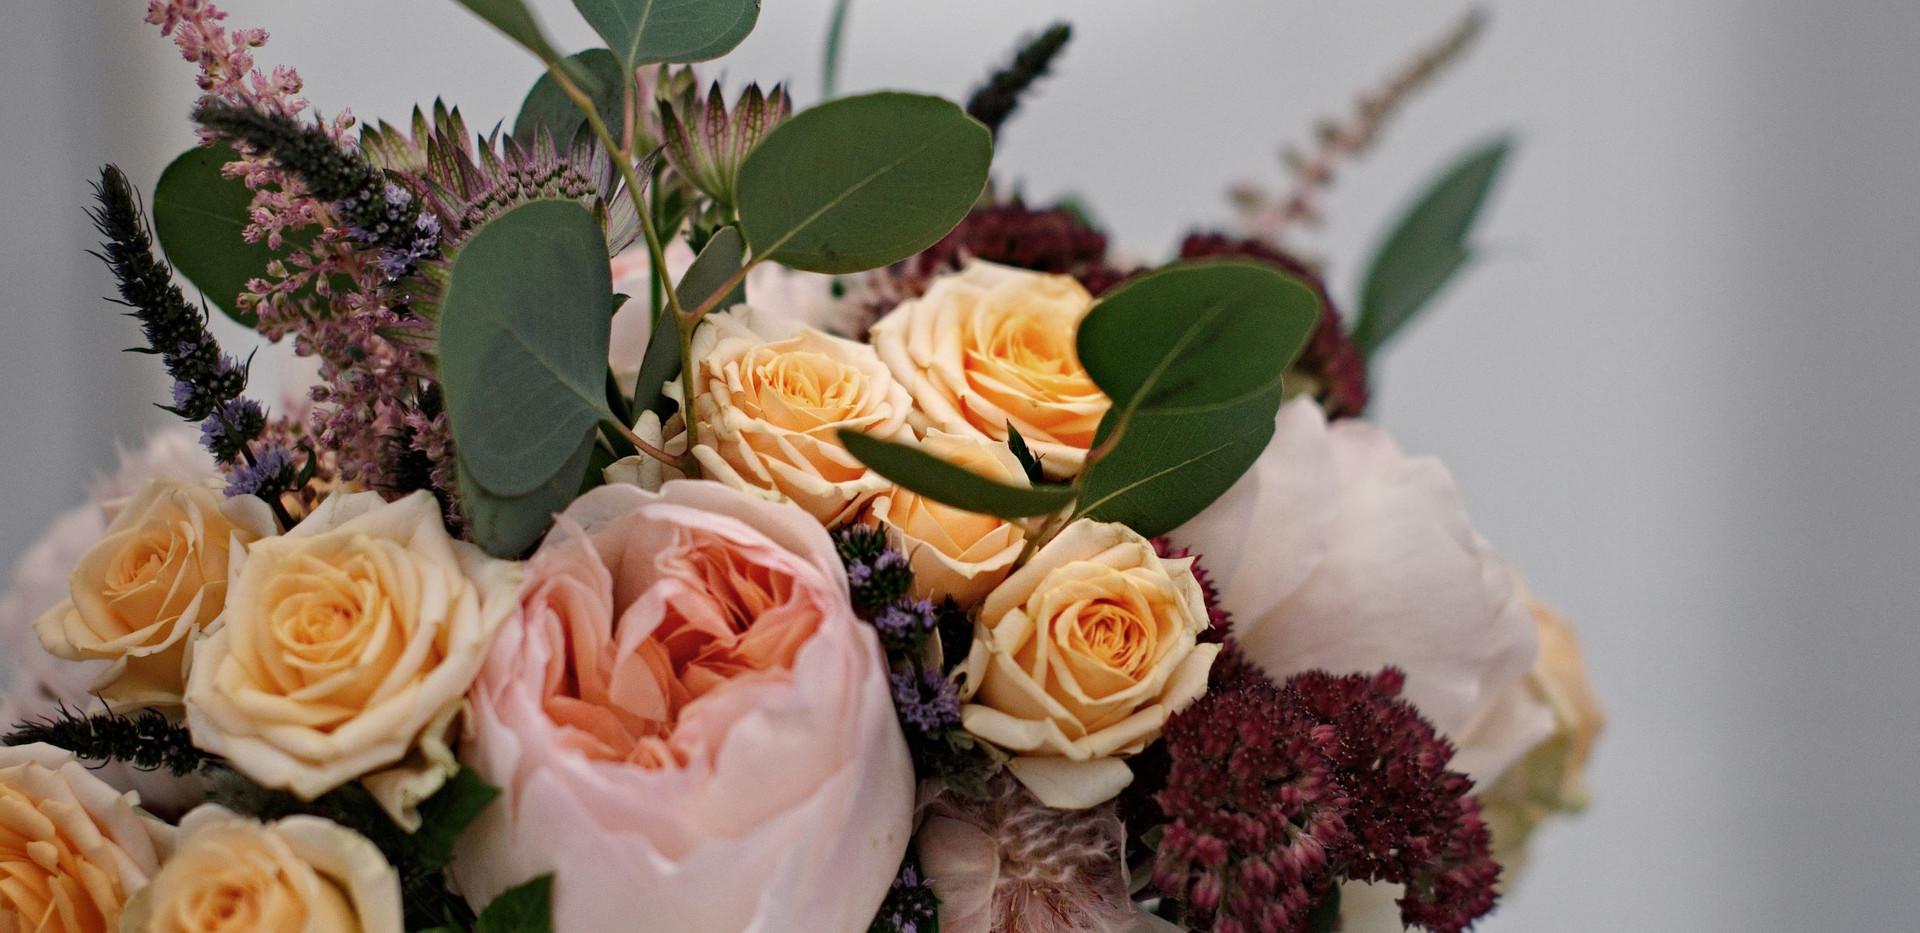 flowers006a.jpg